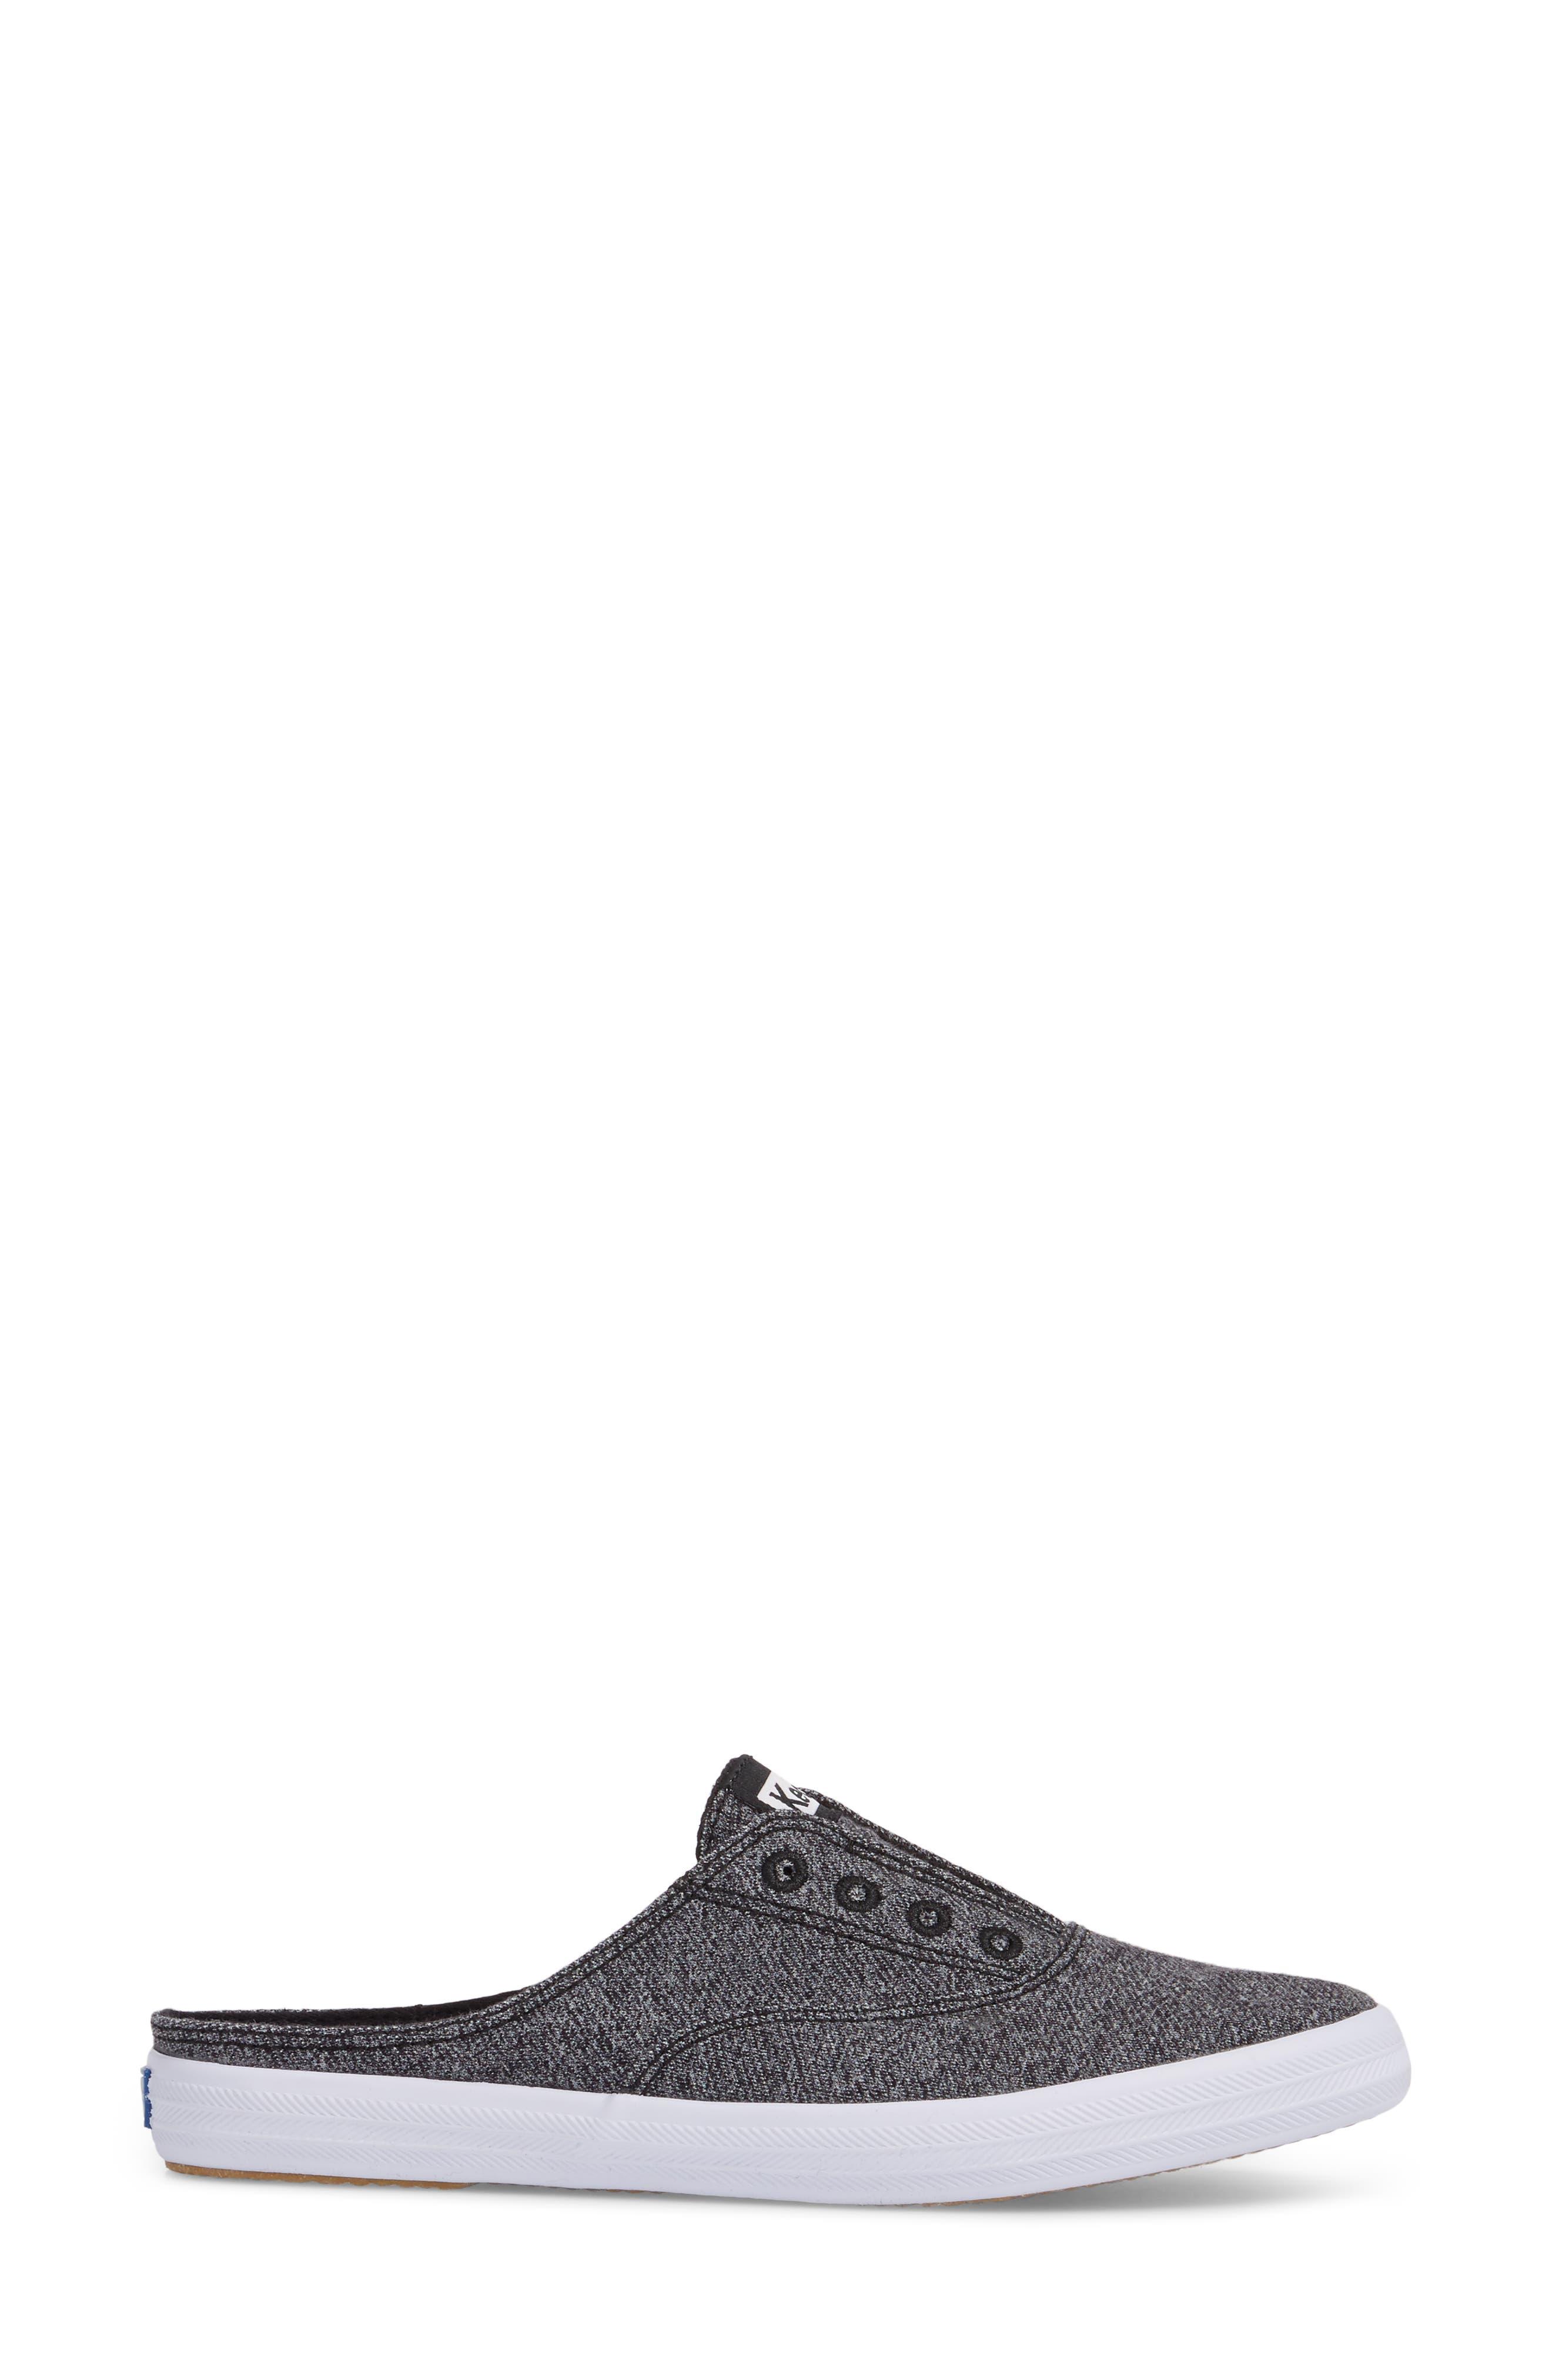 Moxie Sneaker Mule,                             Alternate thumbnail 3, color,                             021